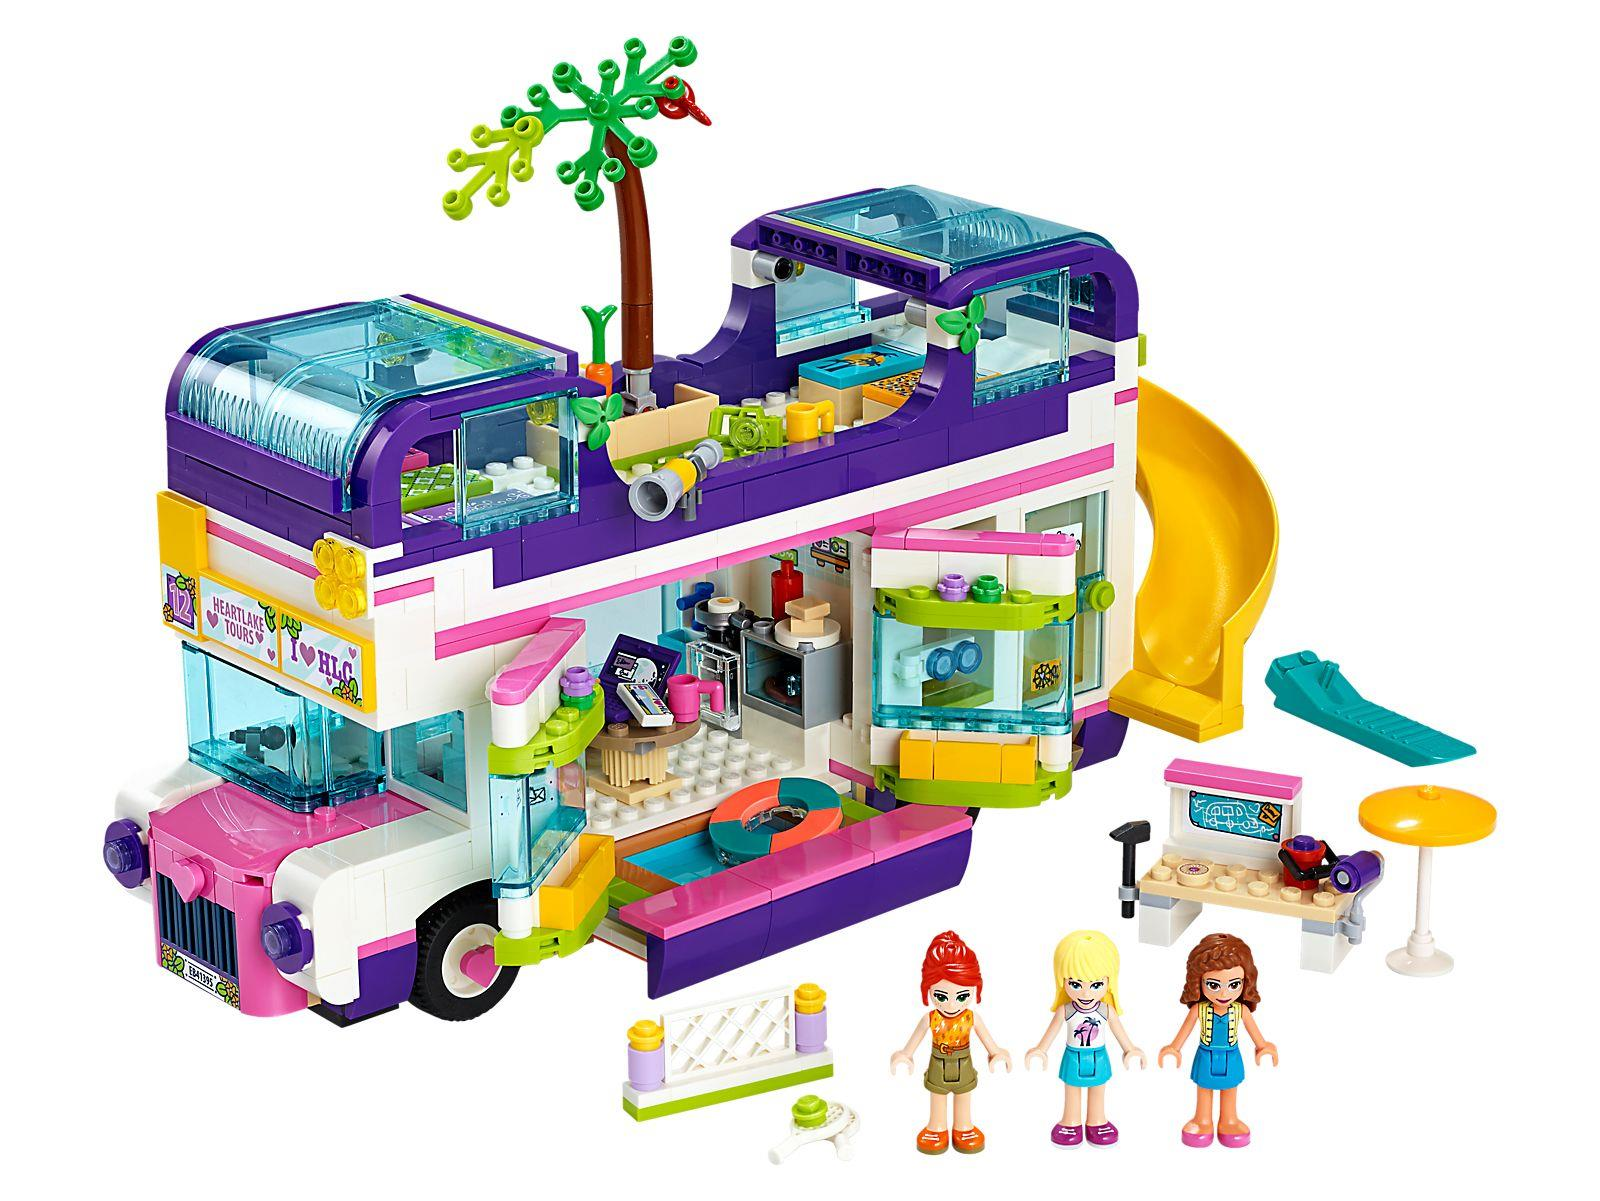 Lego Friends 41389 Stephanie/'s Ice Cream Cart Building Set New